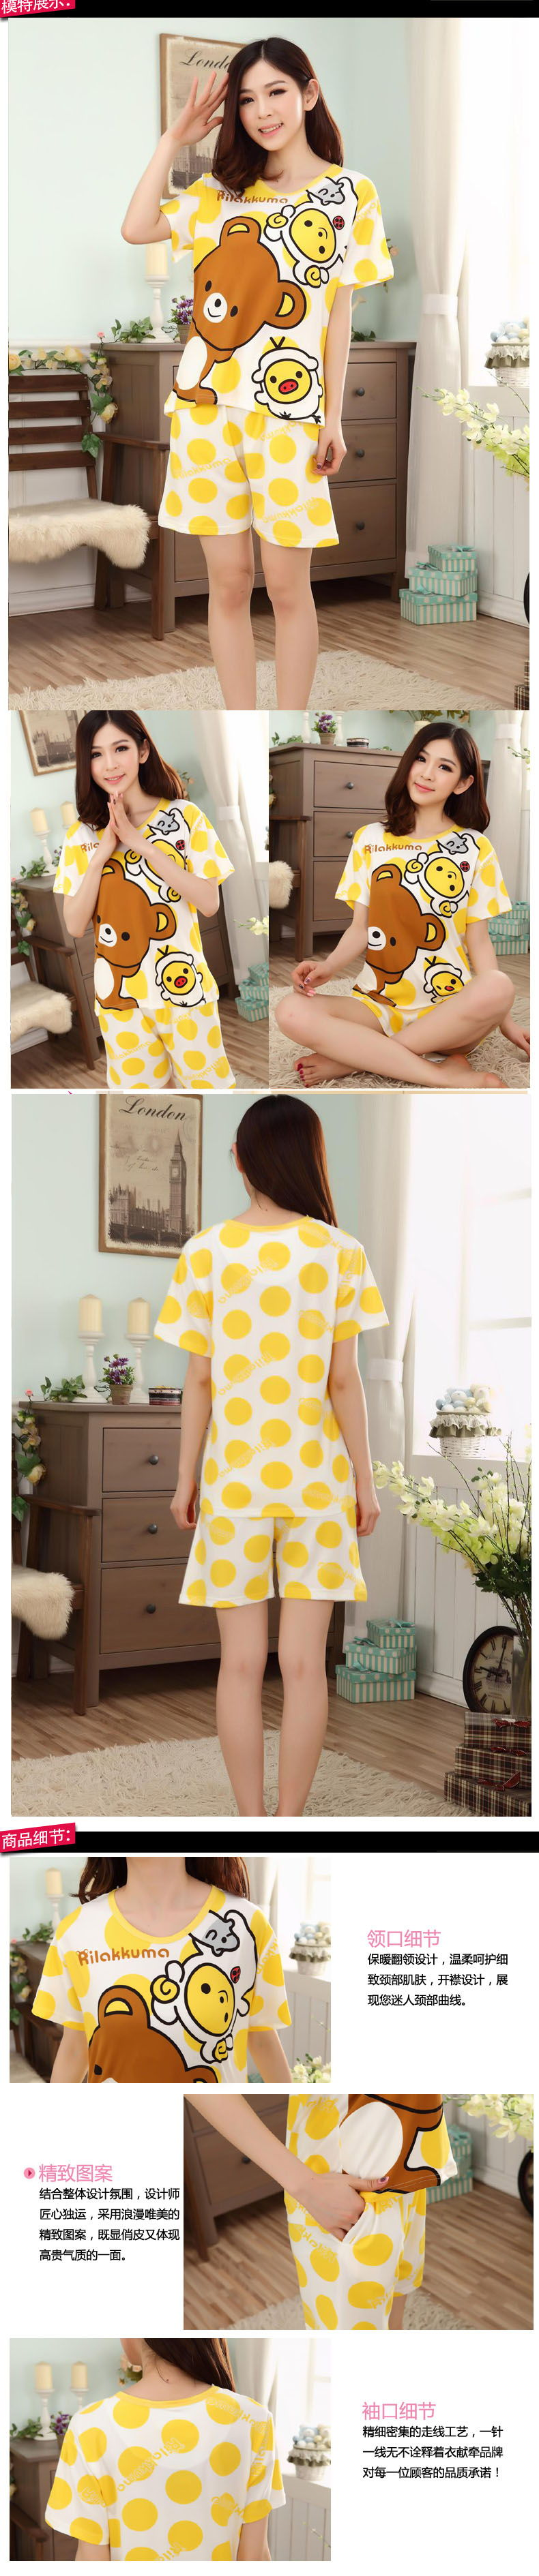 Female Short Sleeved Sleepwear Pajamas Night Dress Cartoon Korean Styles